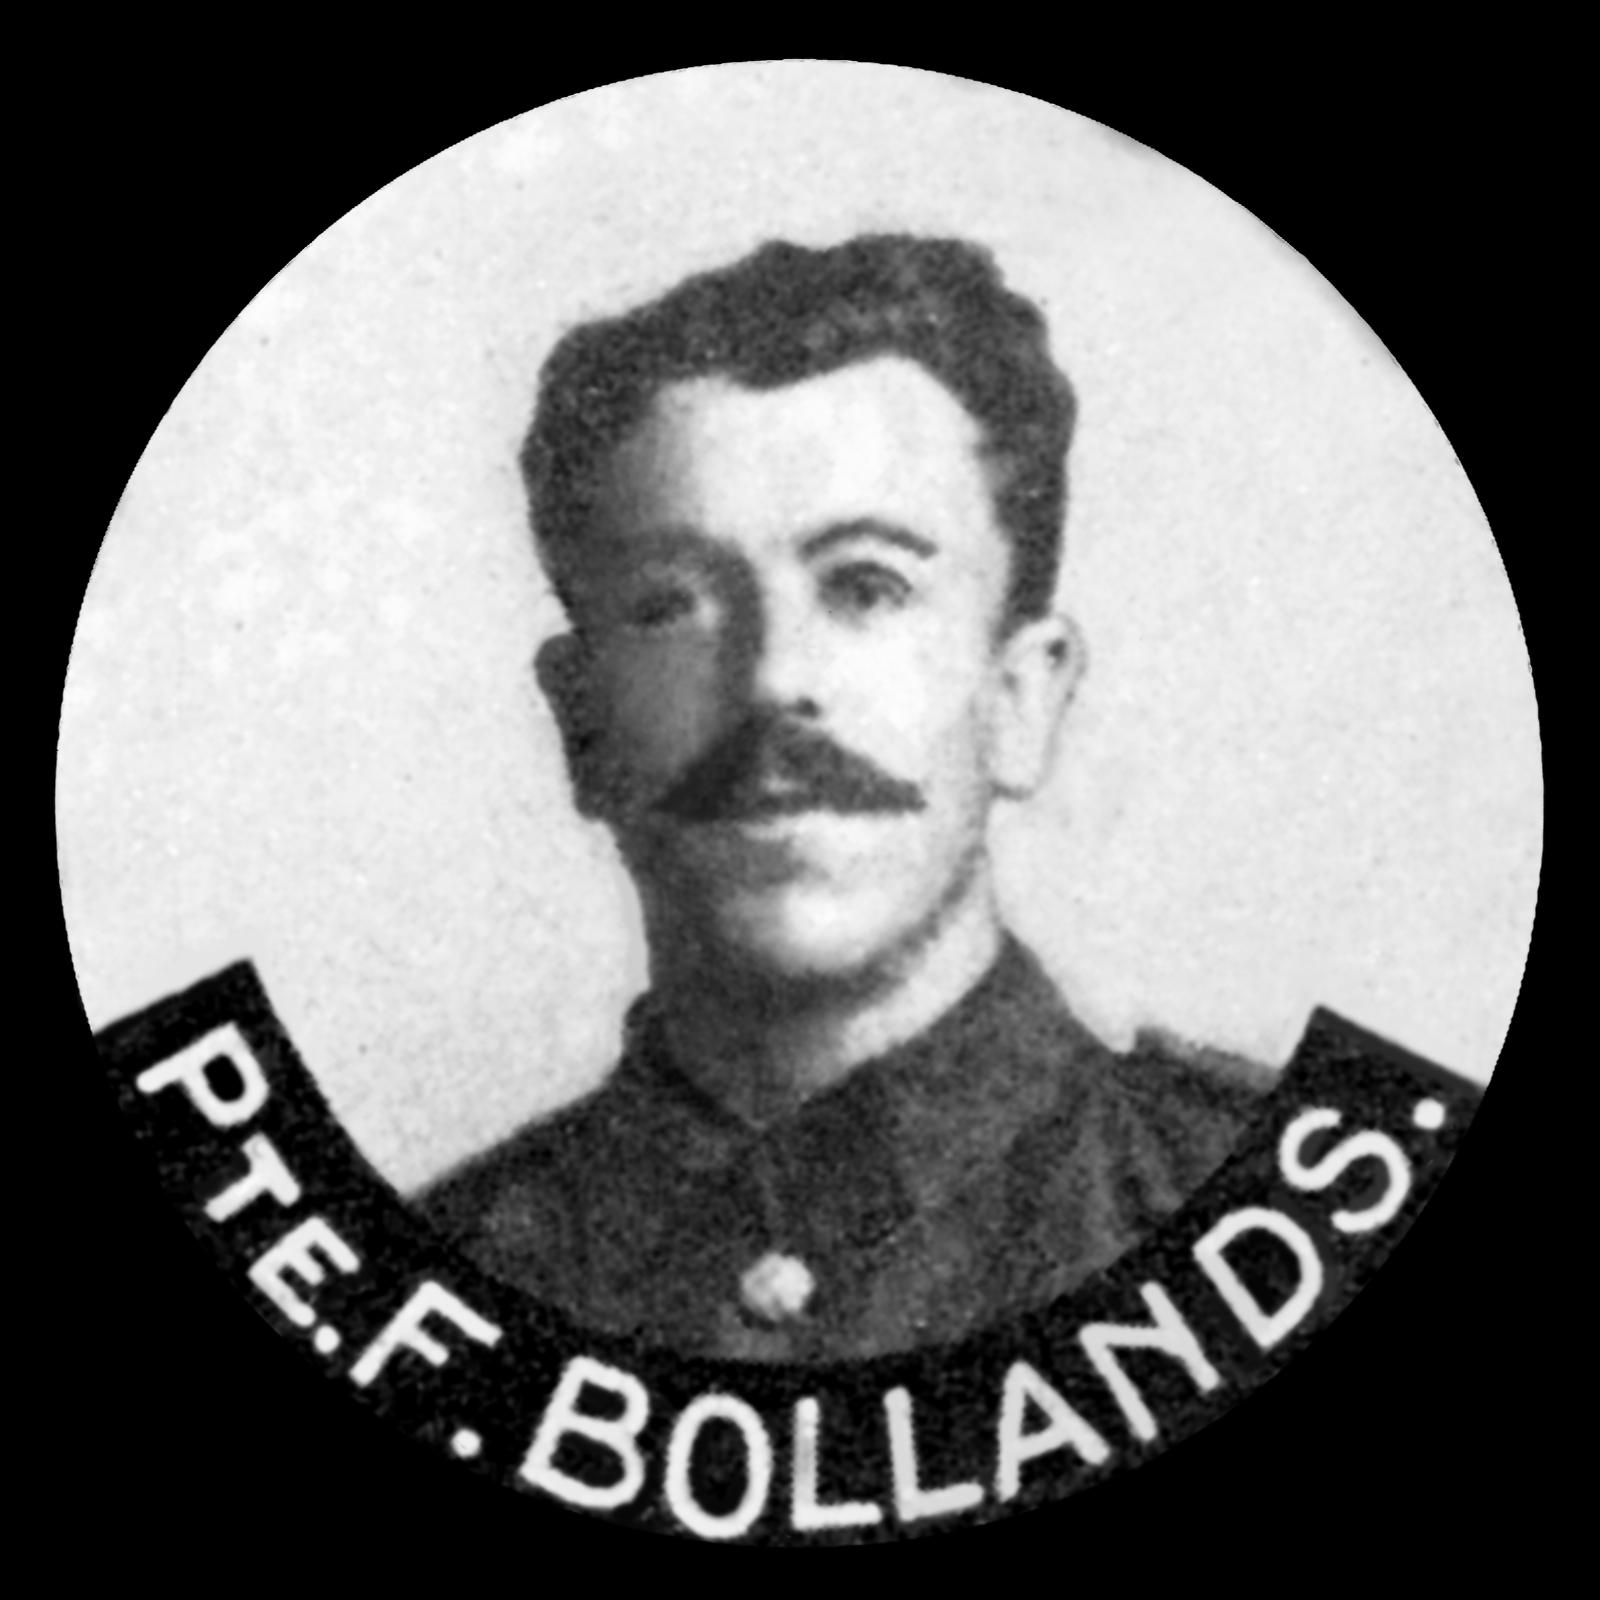 BOLLANDS Frederick